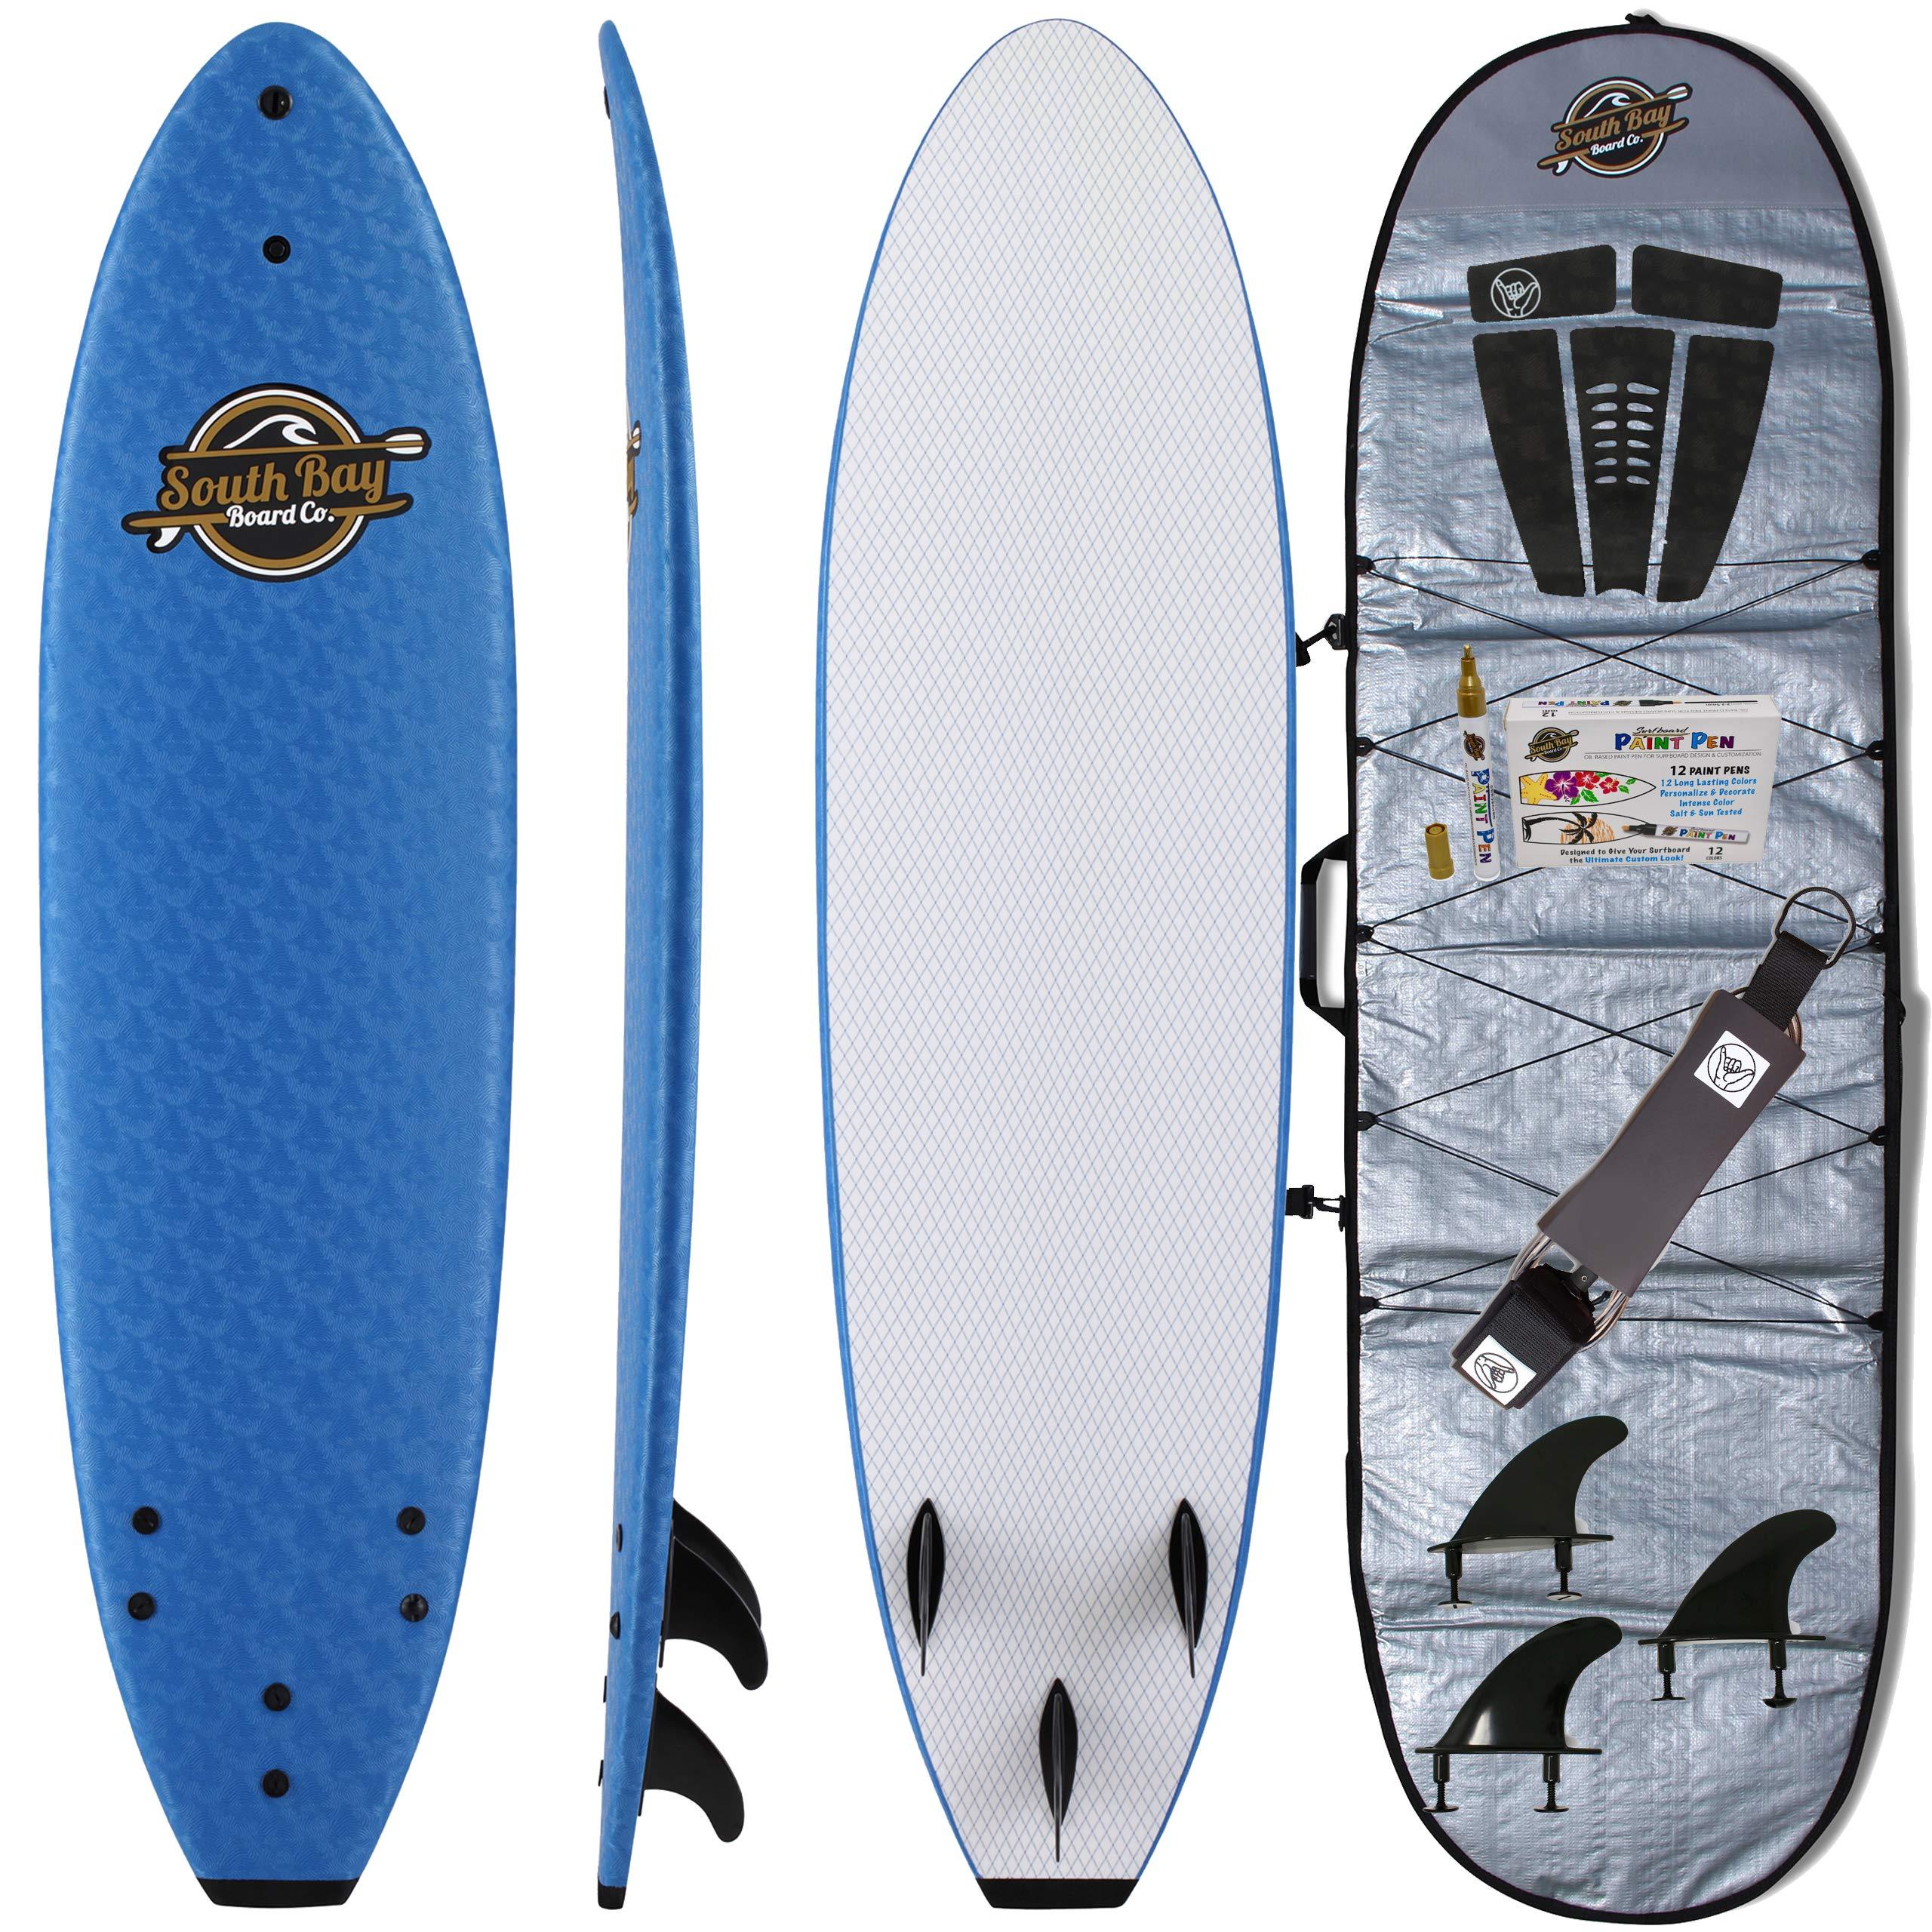 Soft Top Surfboard + Bag Package